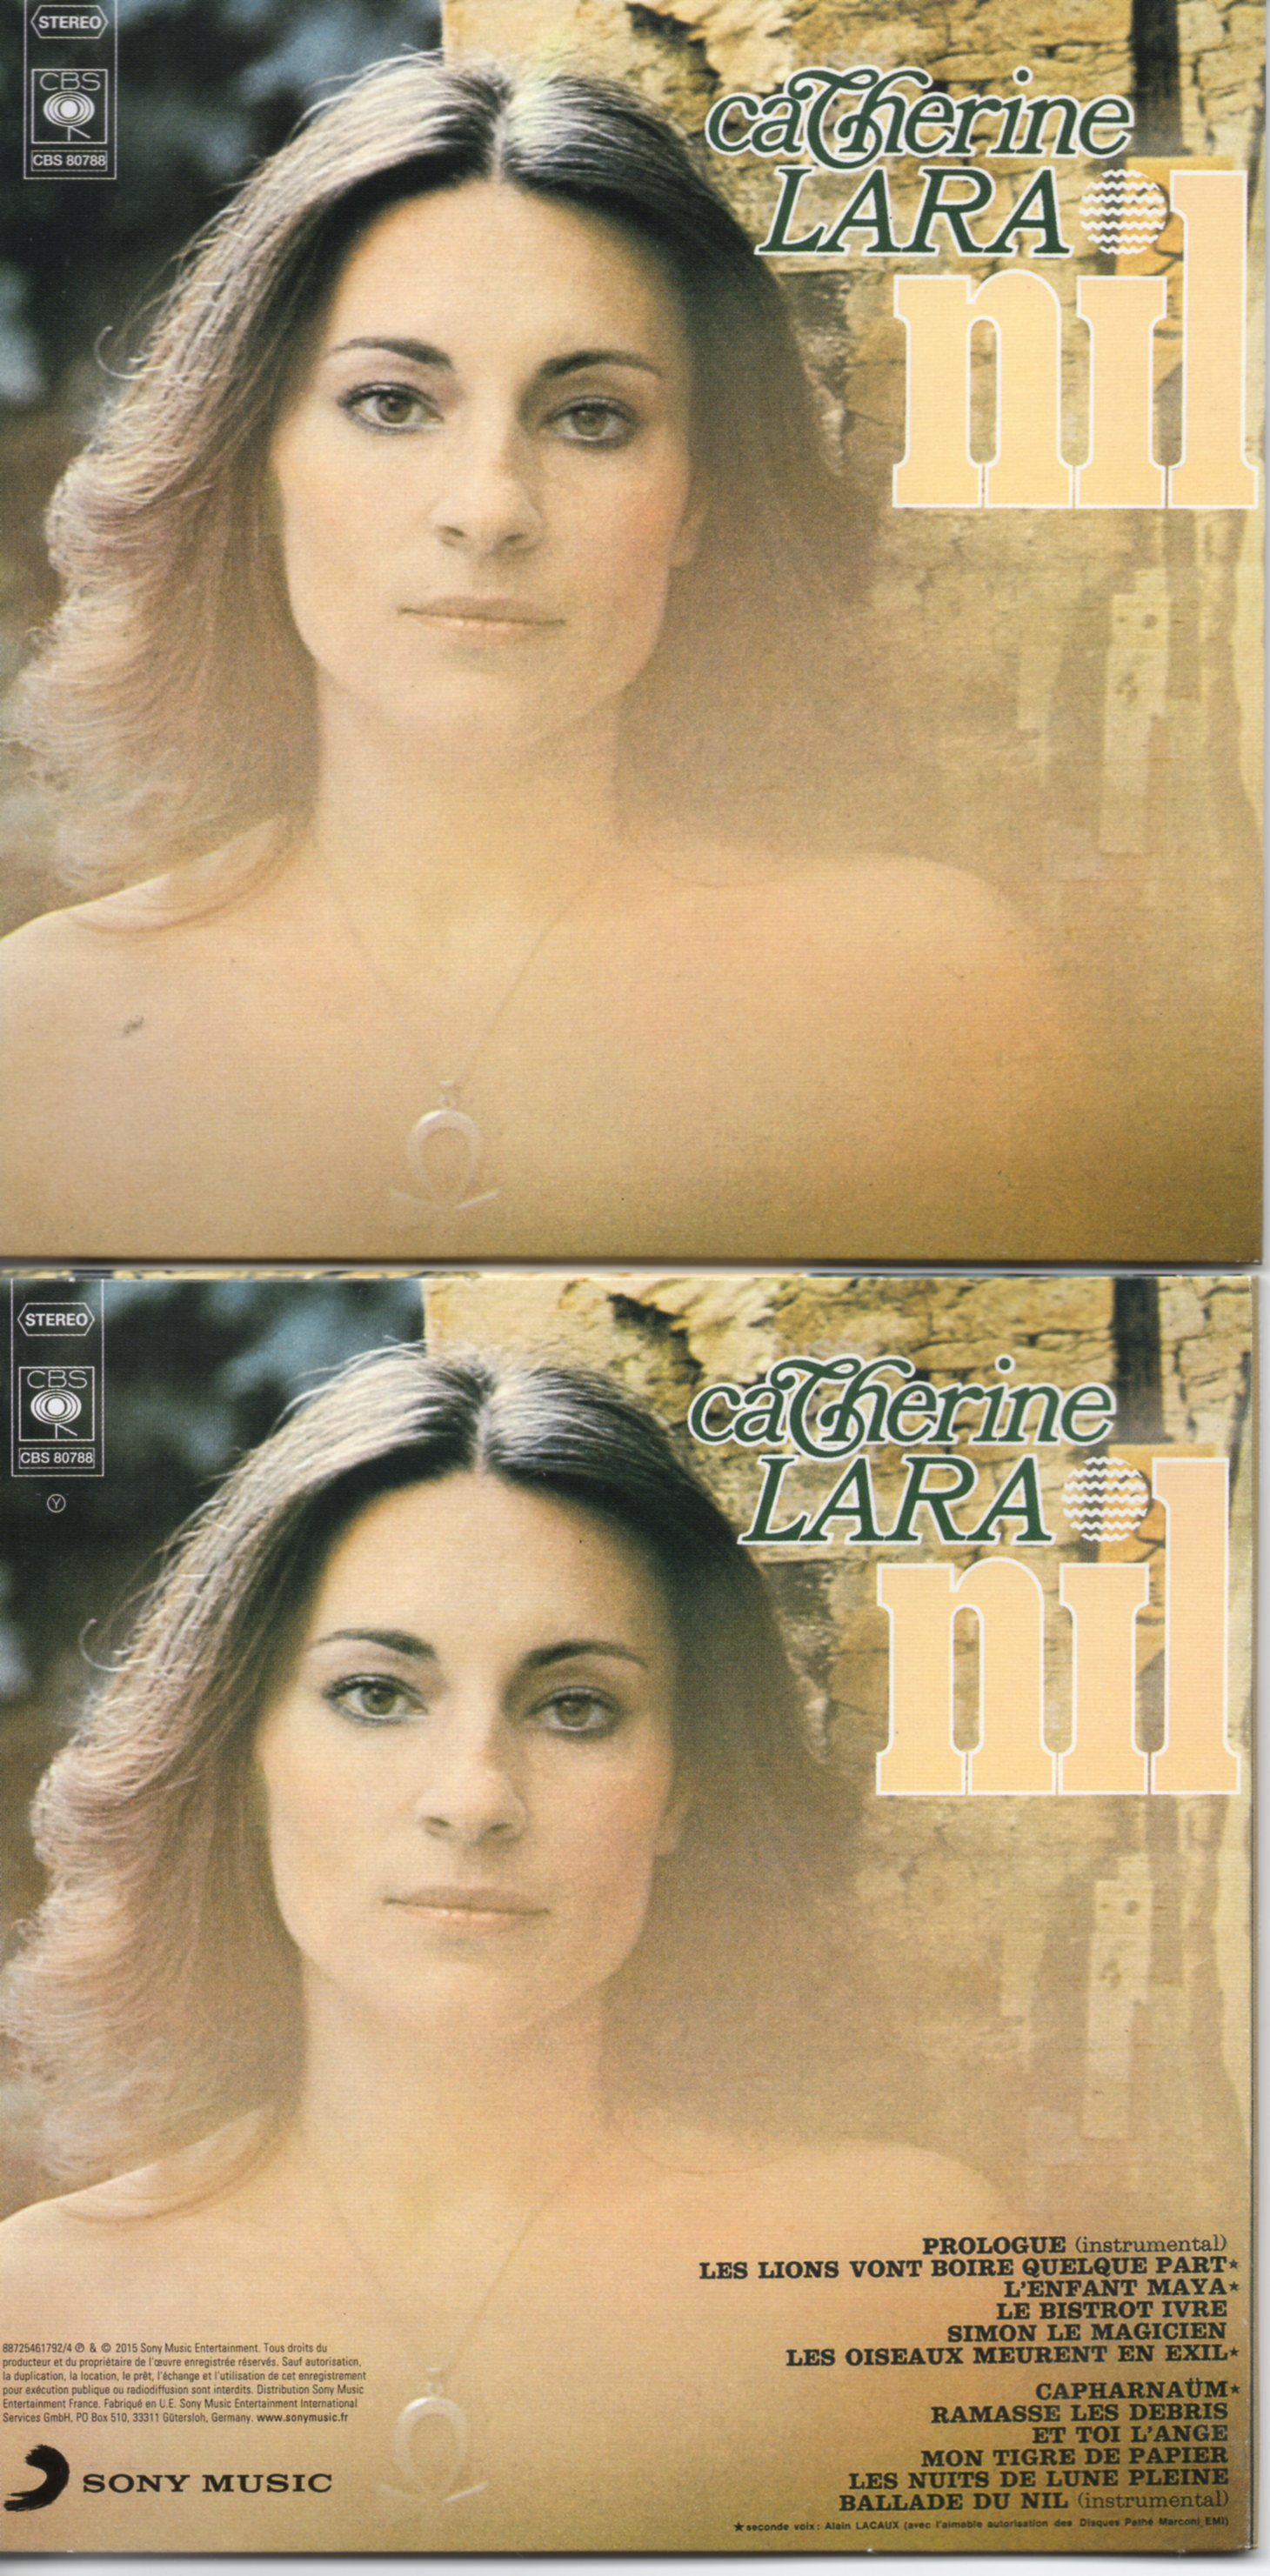 CATHERINE LARA - Nil - MINI LP REPLICA - 12-TRACK CARD SLEEVE - Pochette Cartonnée - CD